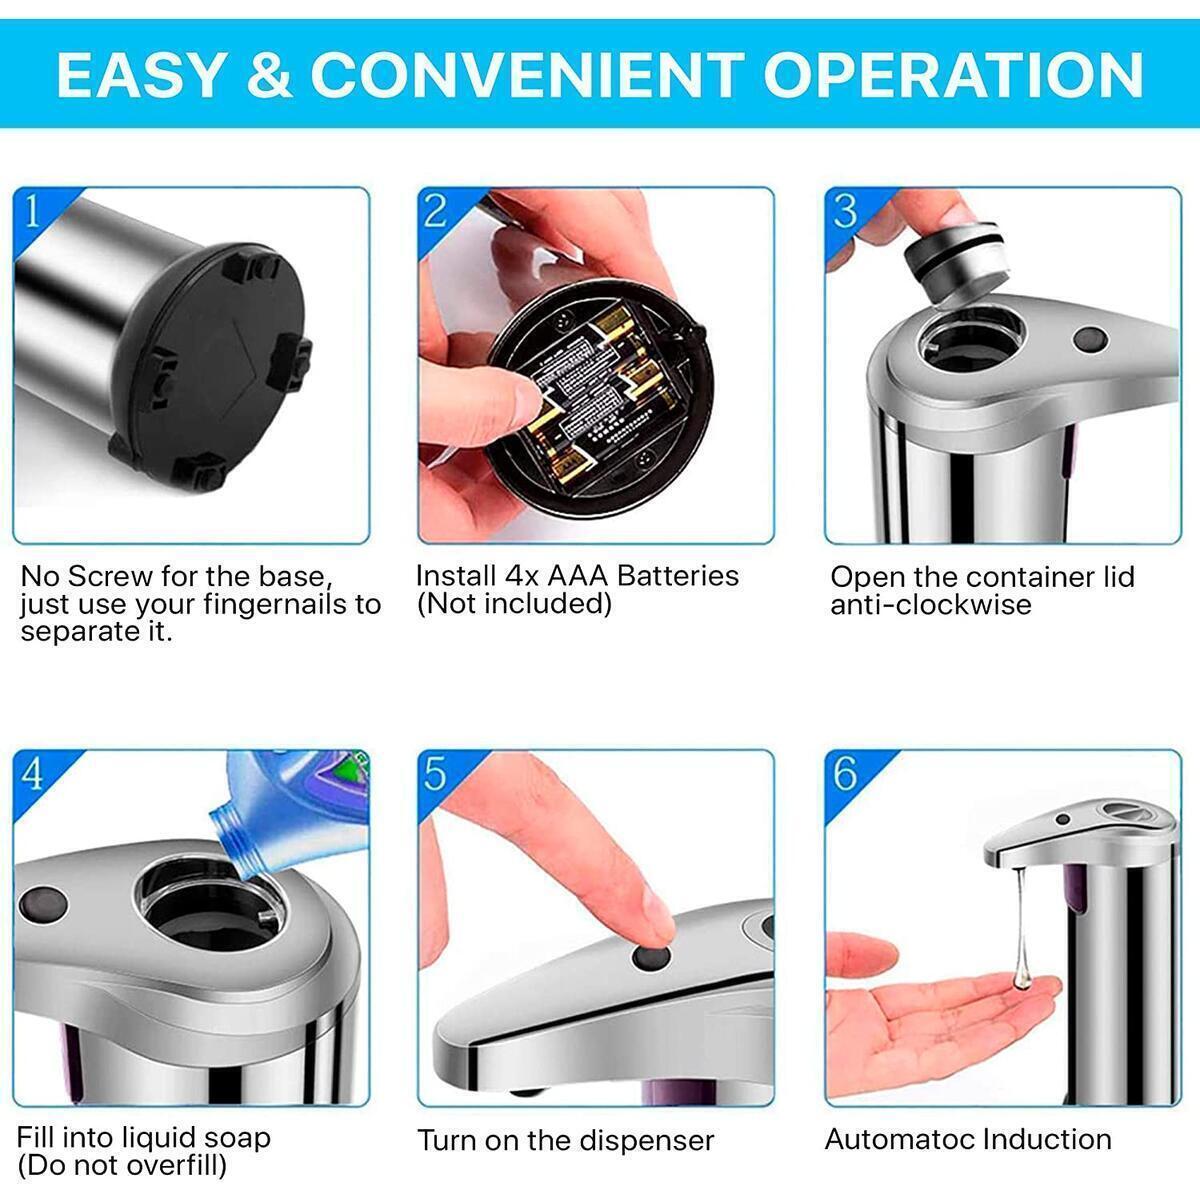 My Safe Home - Hands Free Soap Dispenser